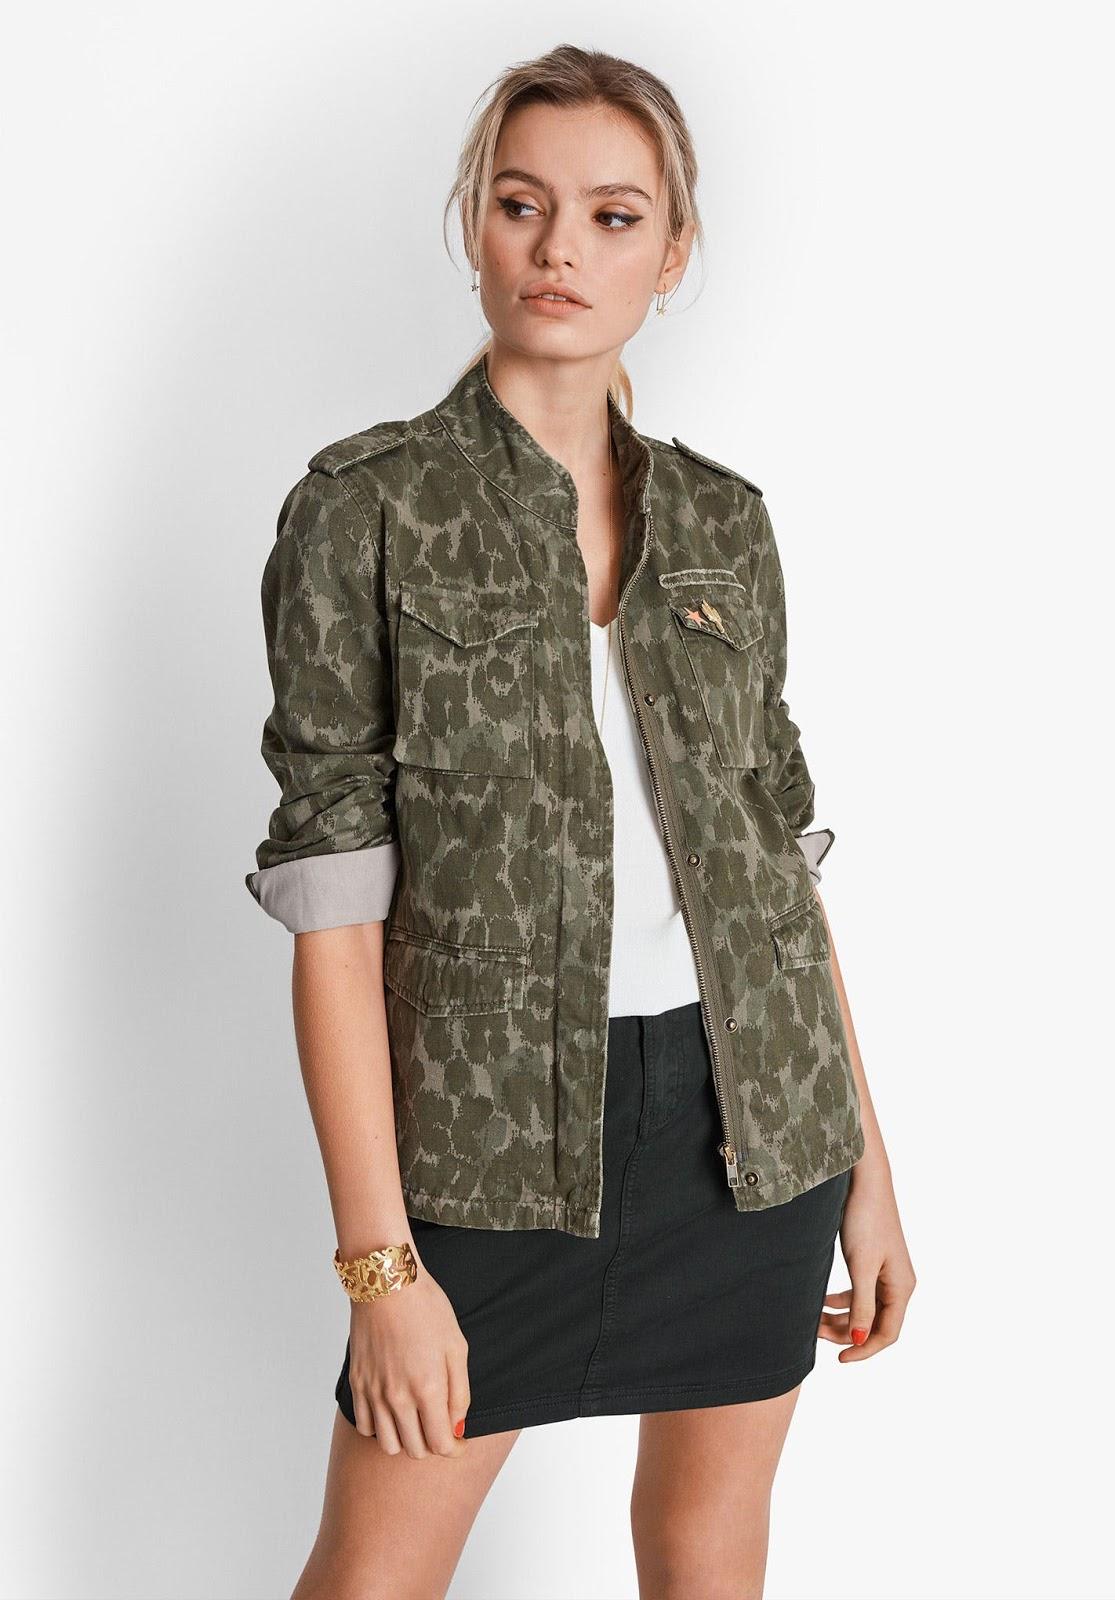 Hush camo military jacket